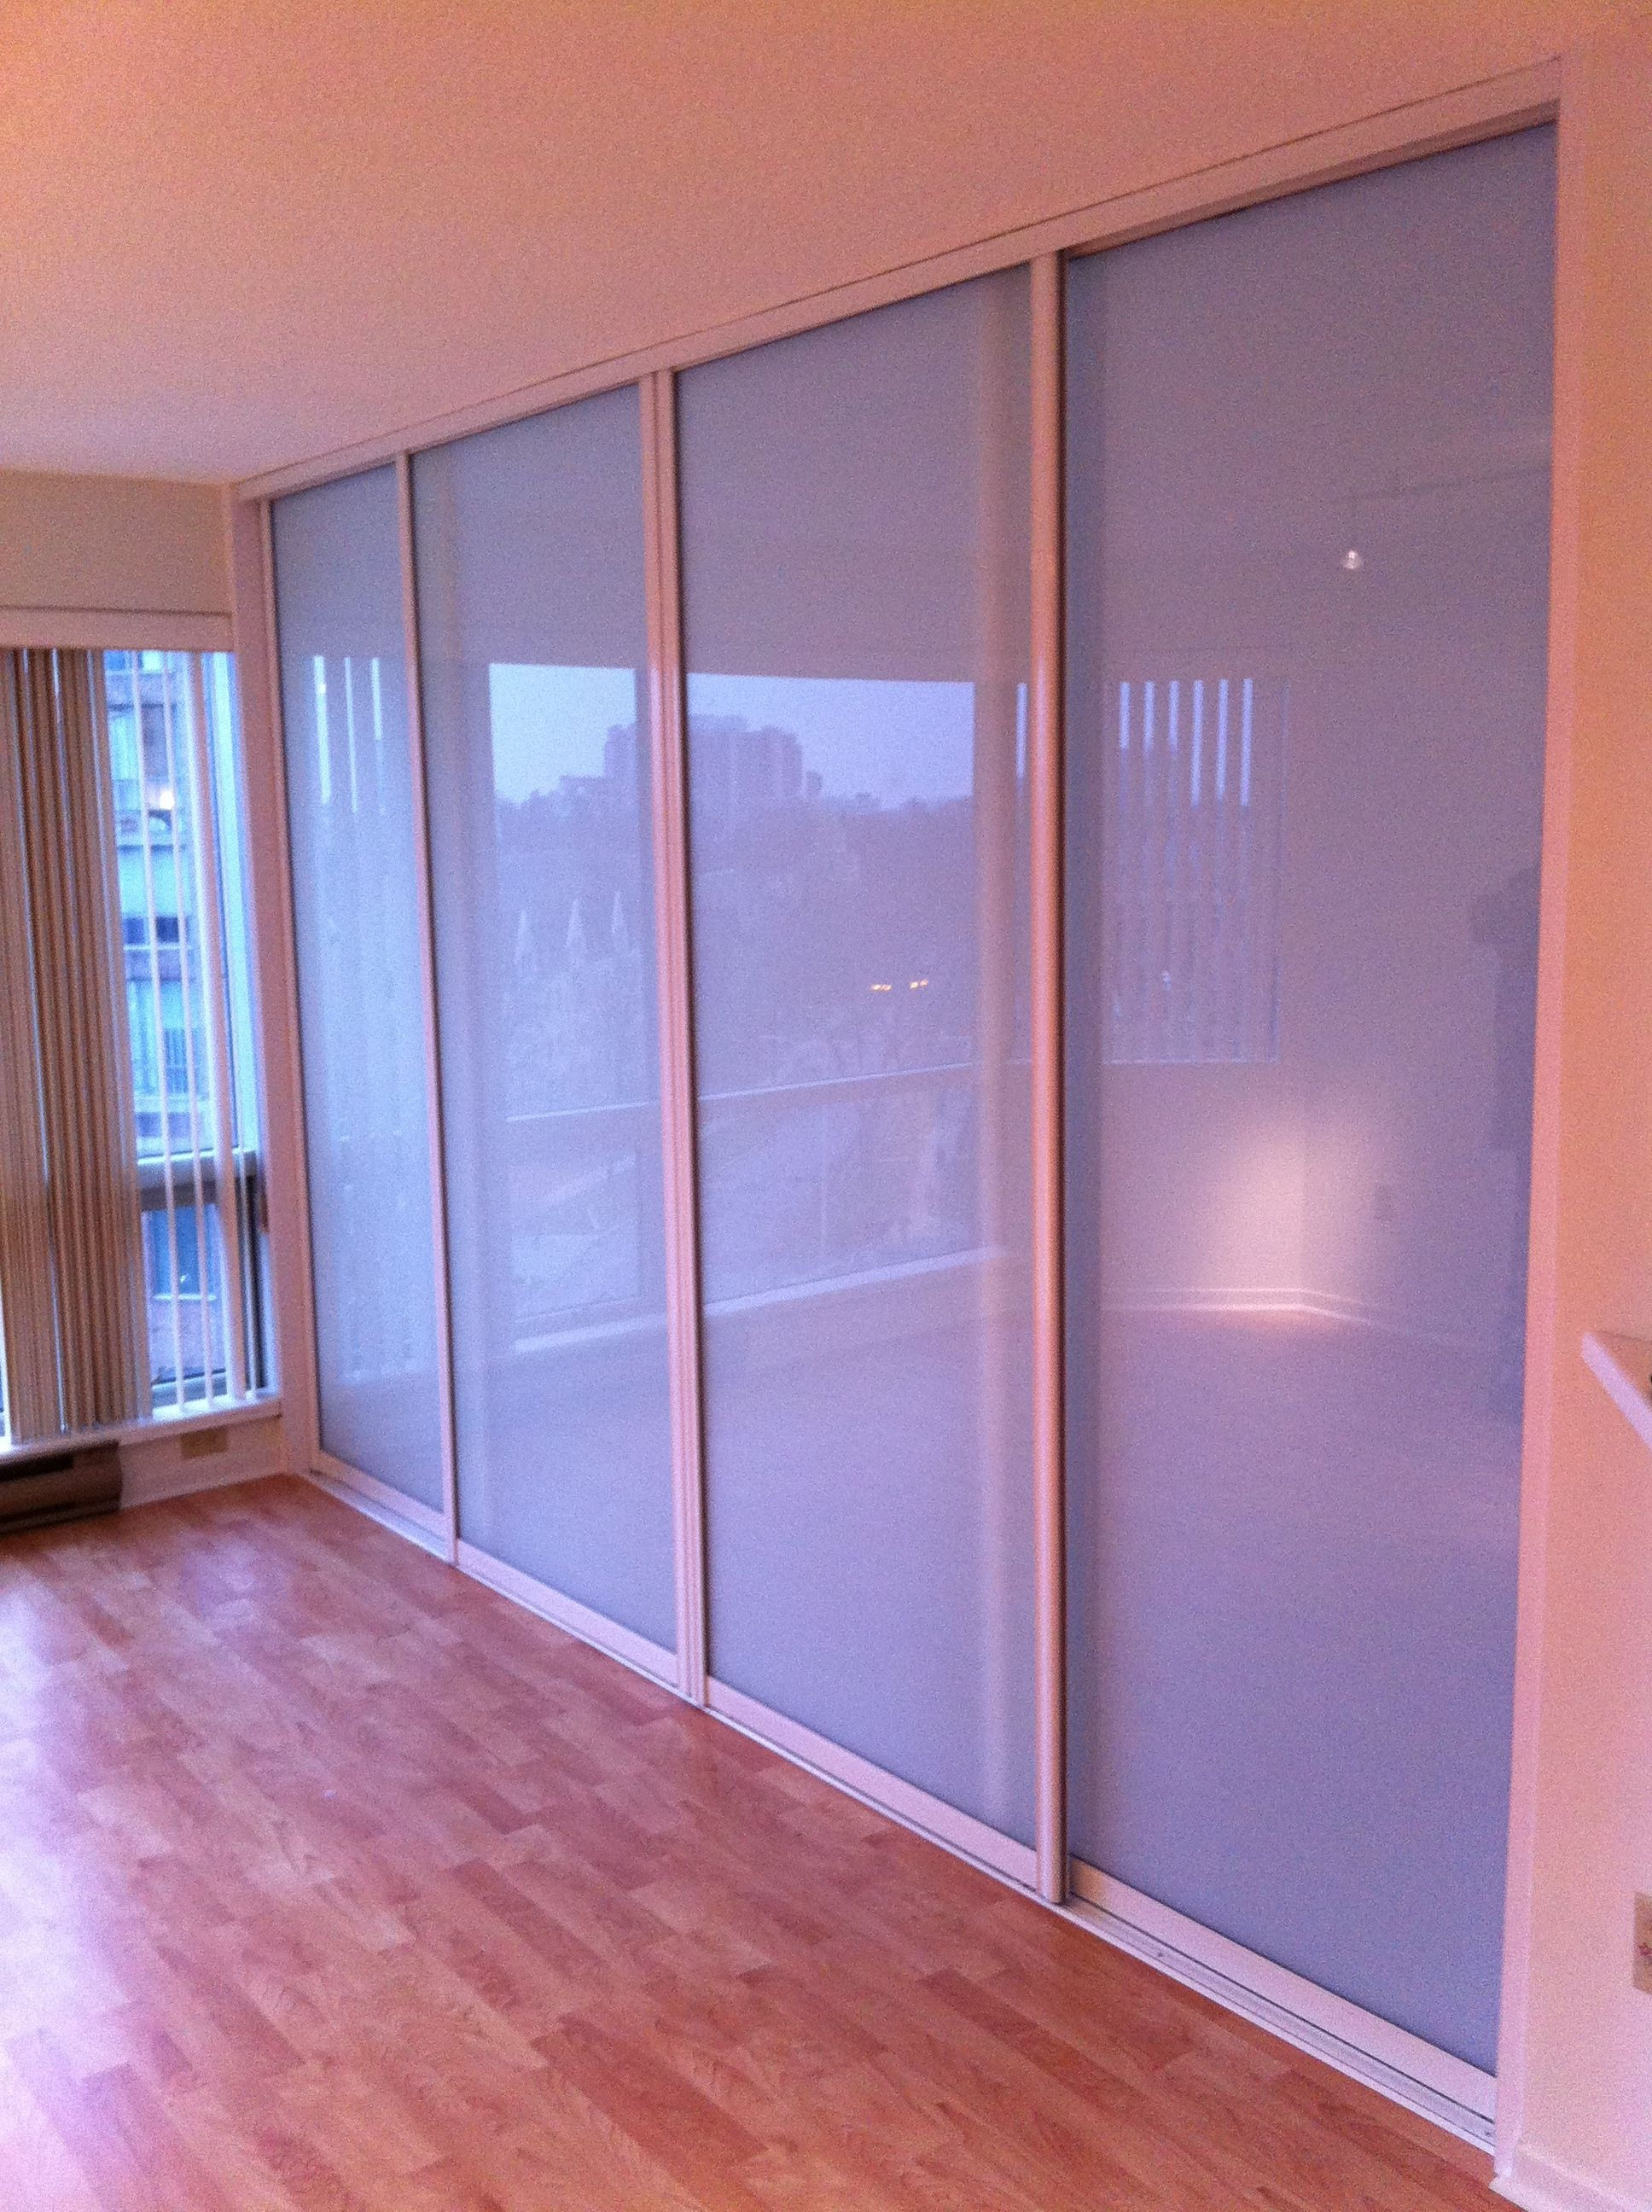 8 Foot Closet Doors Sliding Sliding Closet Doors Sliding Glass Closet Doors Glass Closet Doors